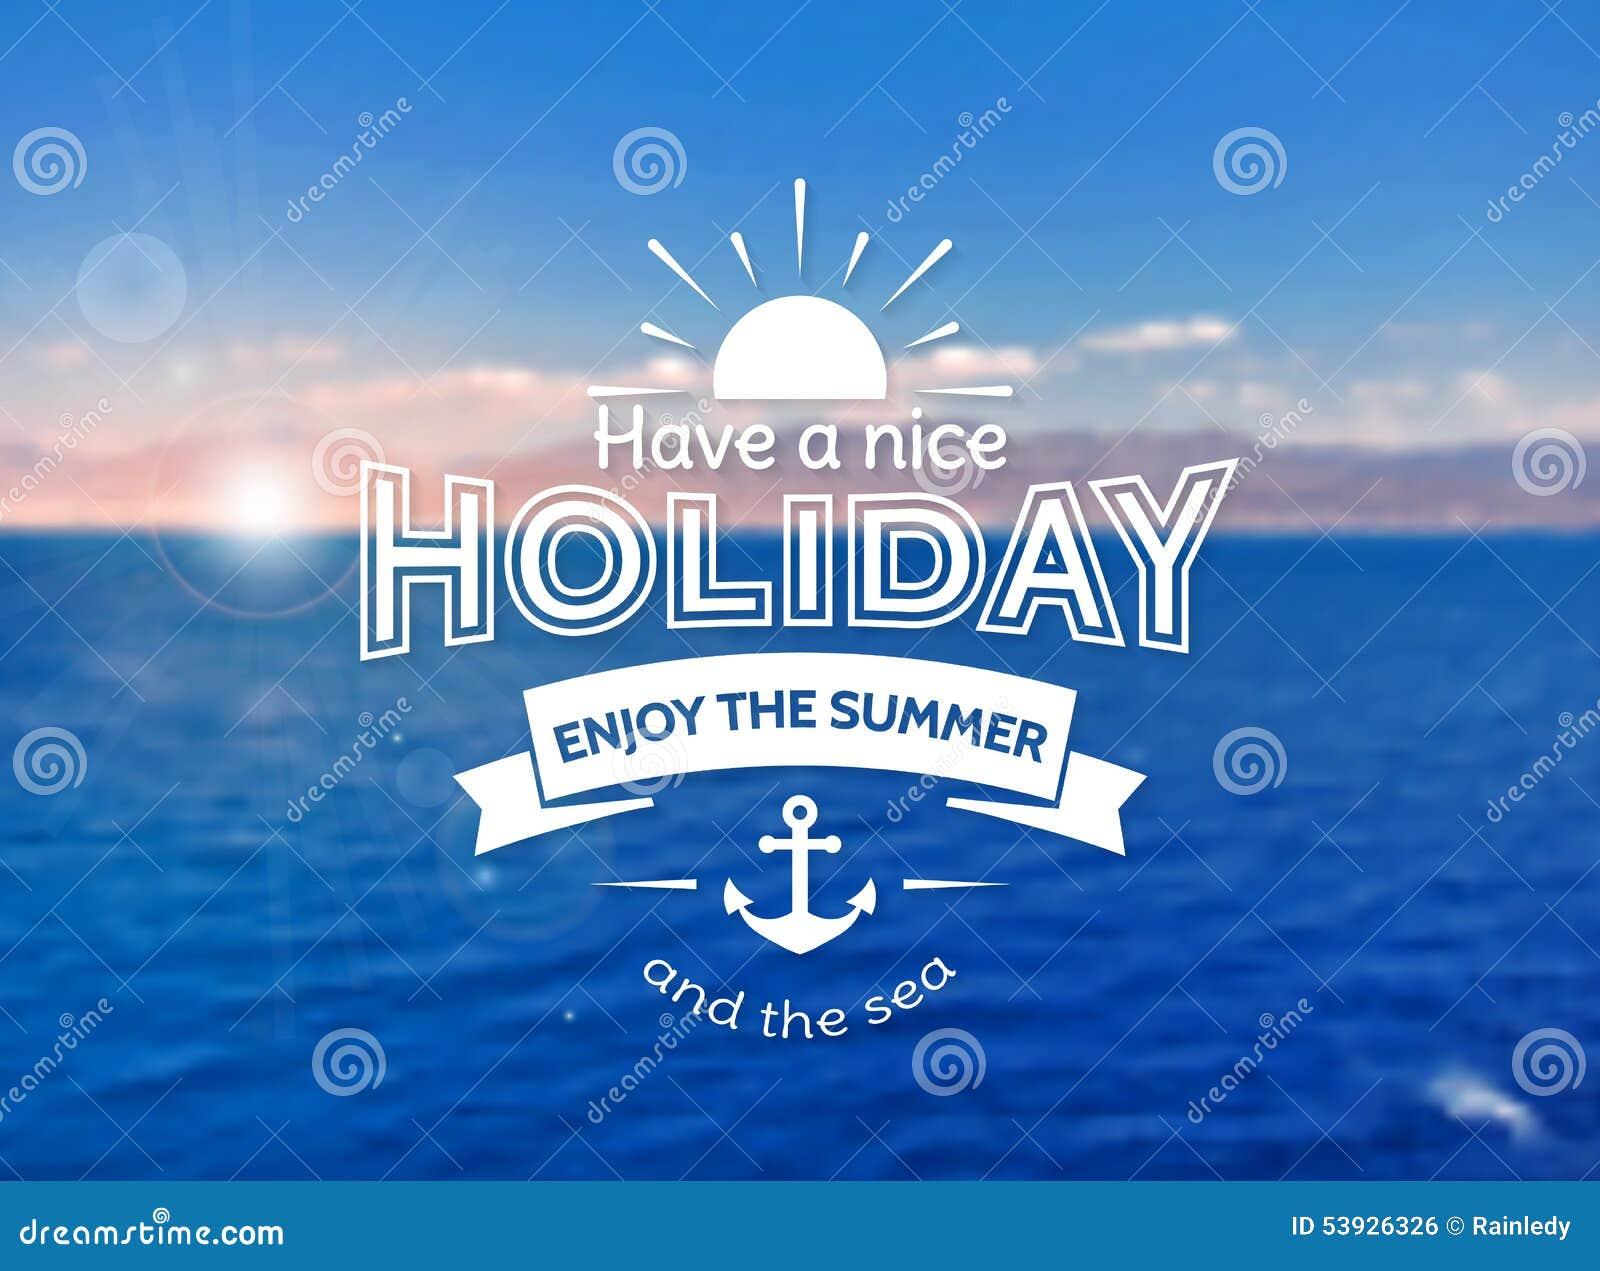 Summer holiday card vector blurred background stock vector summer holiday card vector blurred background kristyandbryce Gallery